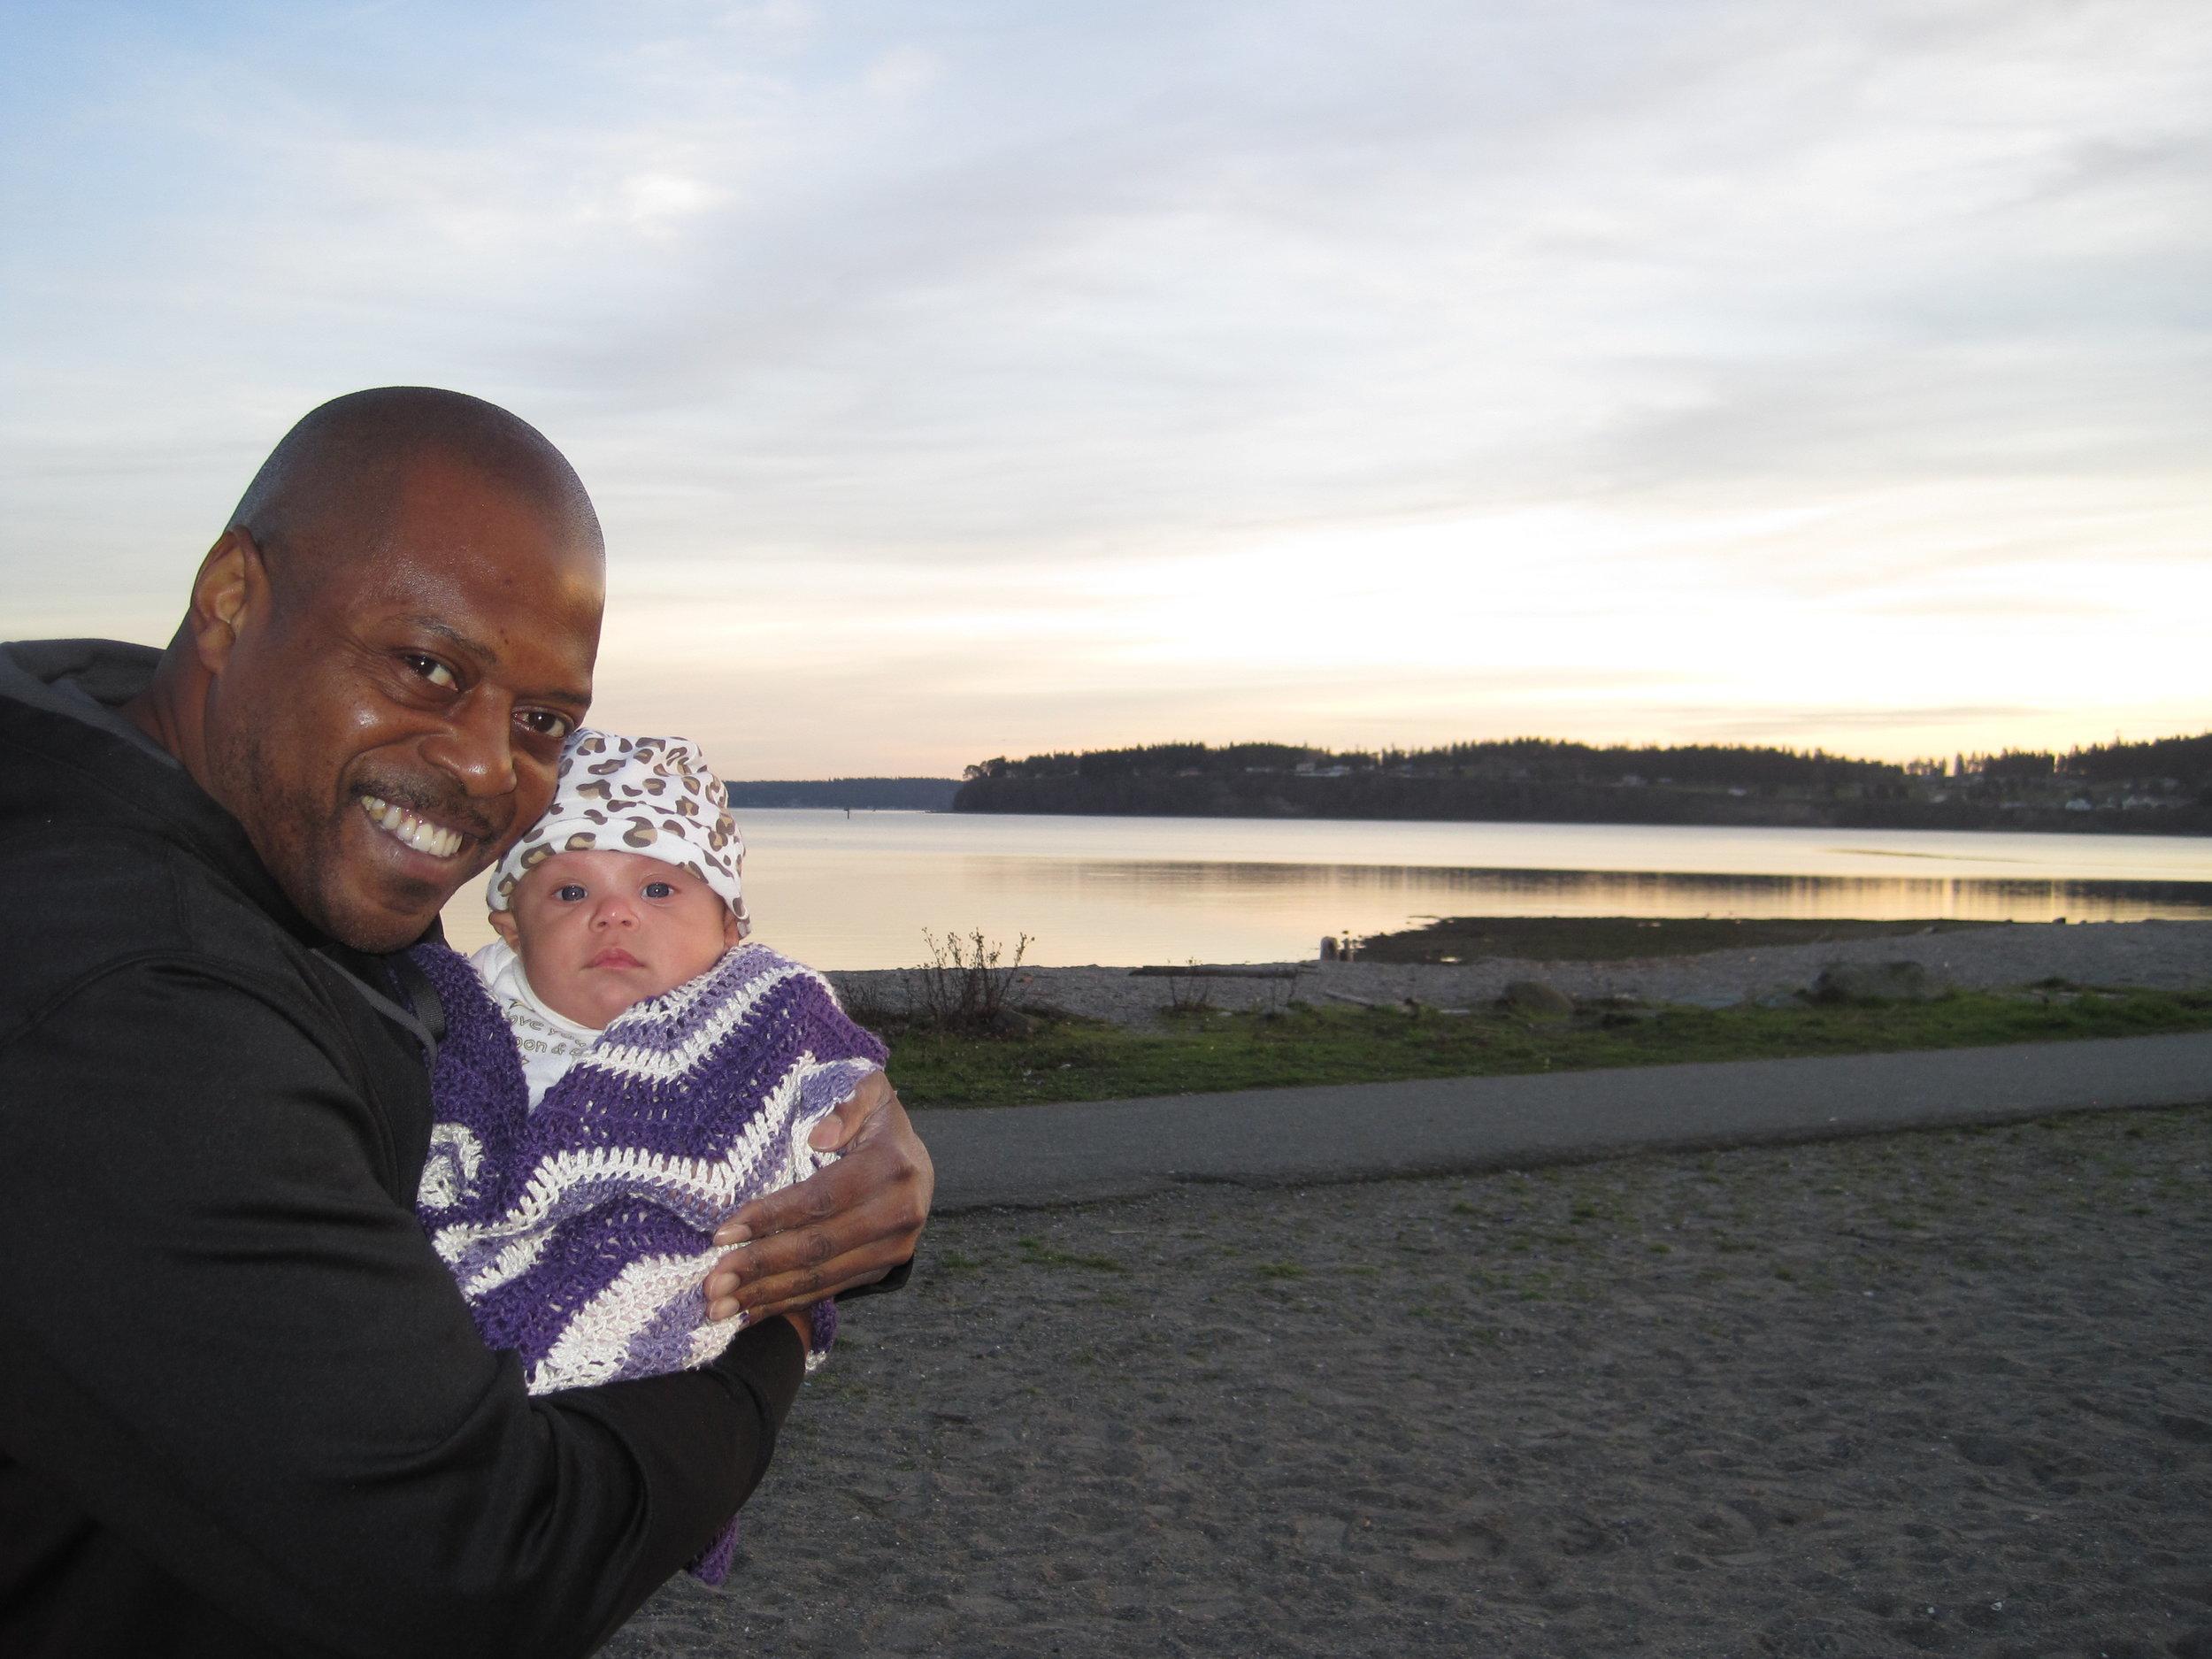 Ralph and his beautiful daughter, Annika